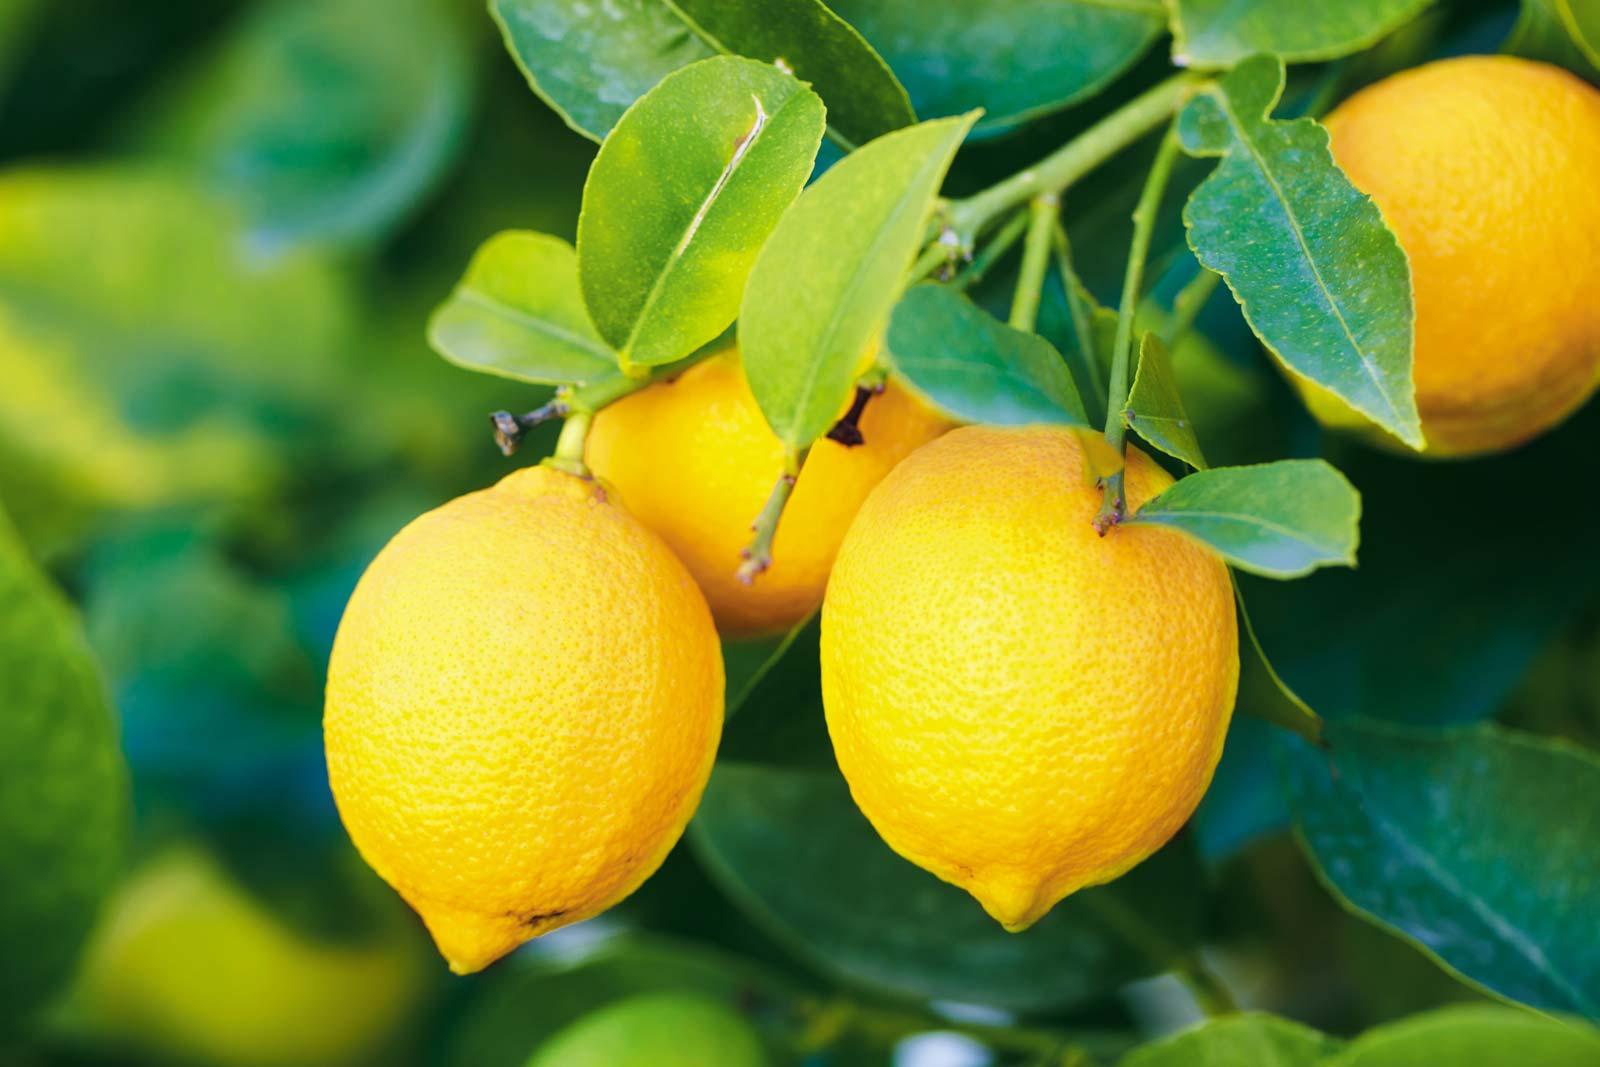 How to make lemon juice